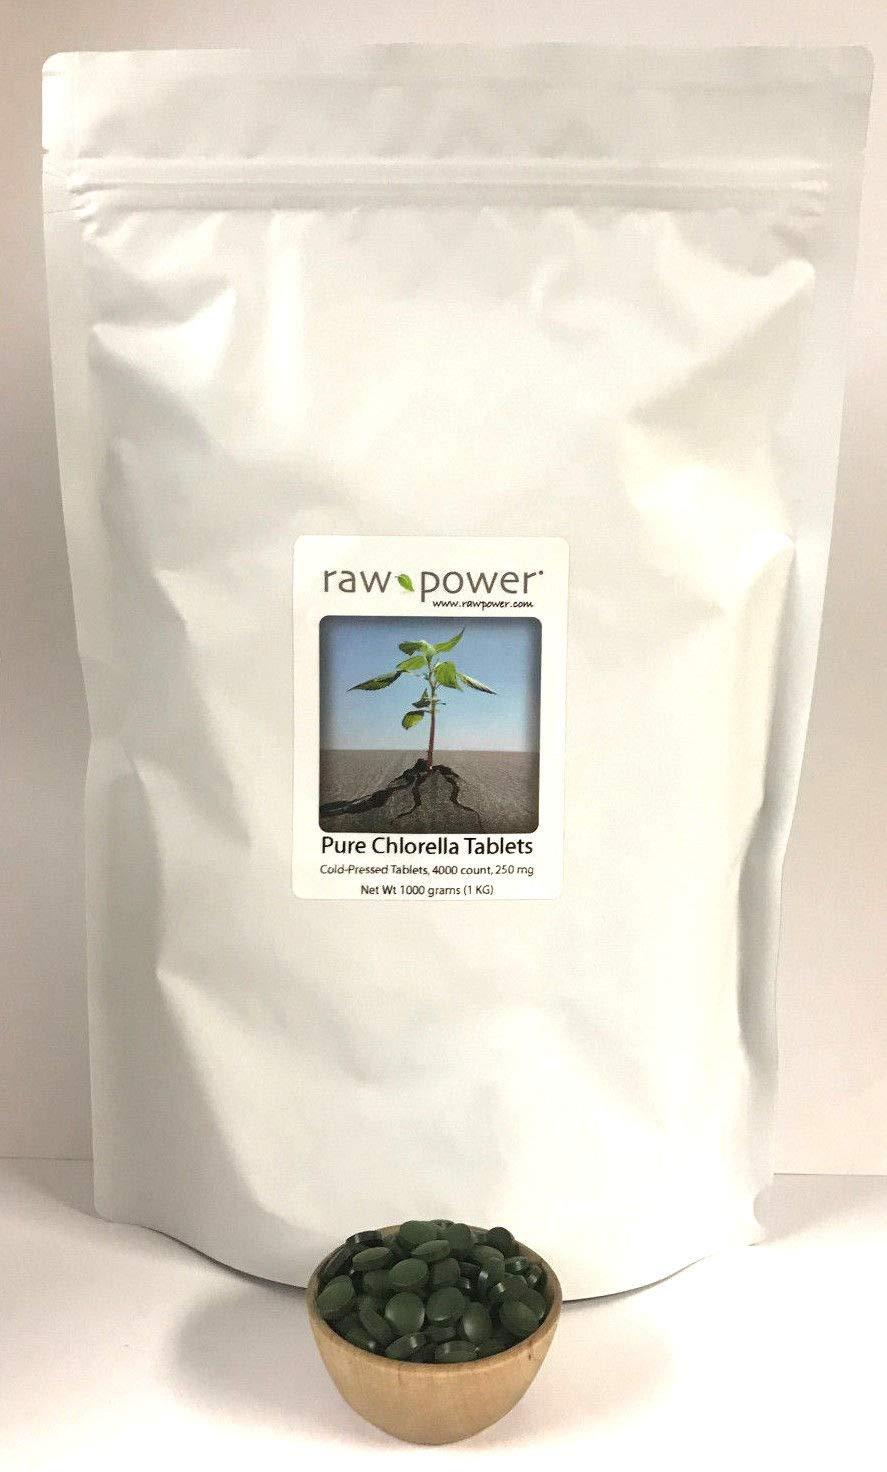 Chlorella Tablets, Clean, Pure, ONE Kilo Bag, Bulk, Premium (4000 Tablets, 250mg Each, 1000 Grams Total), Raw Power Organics Brand